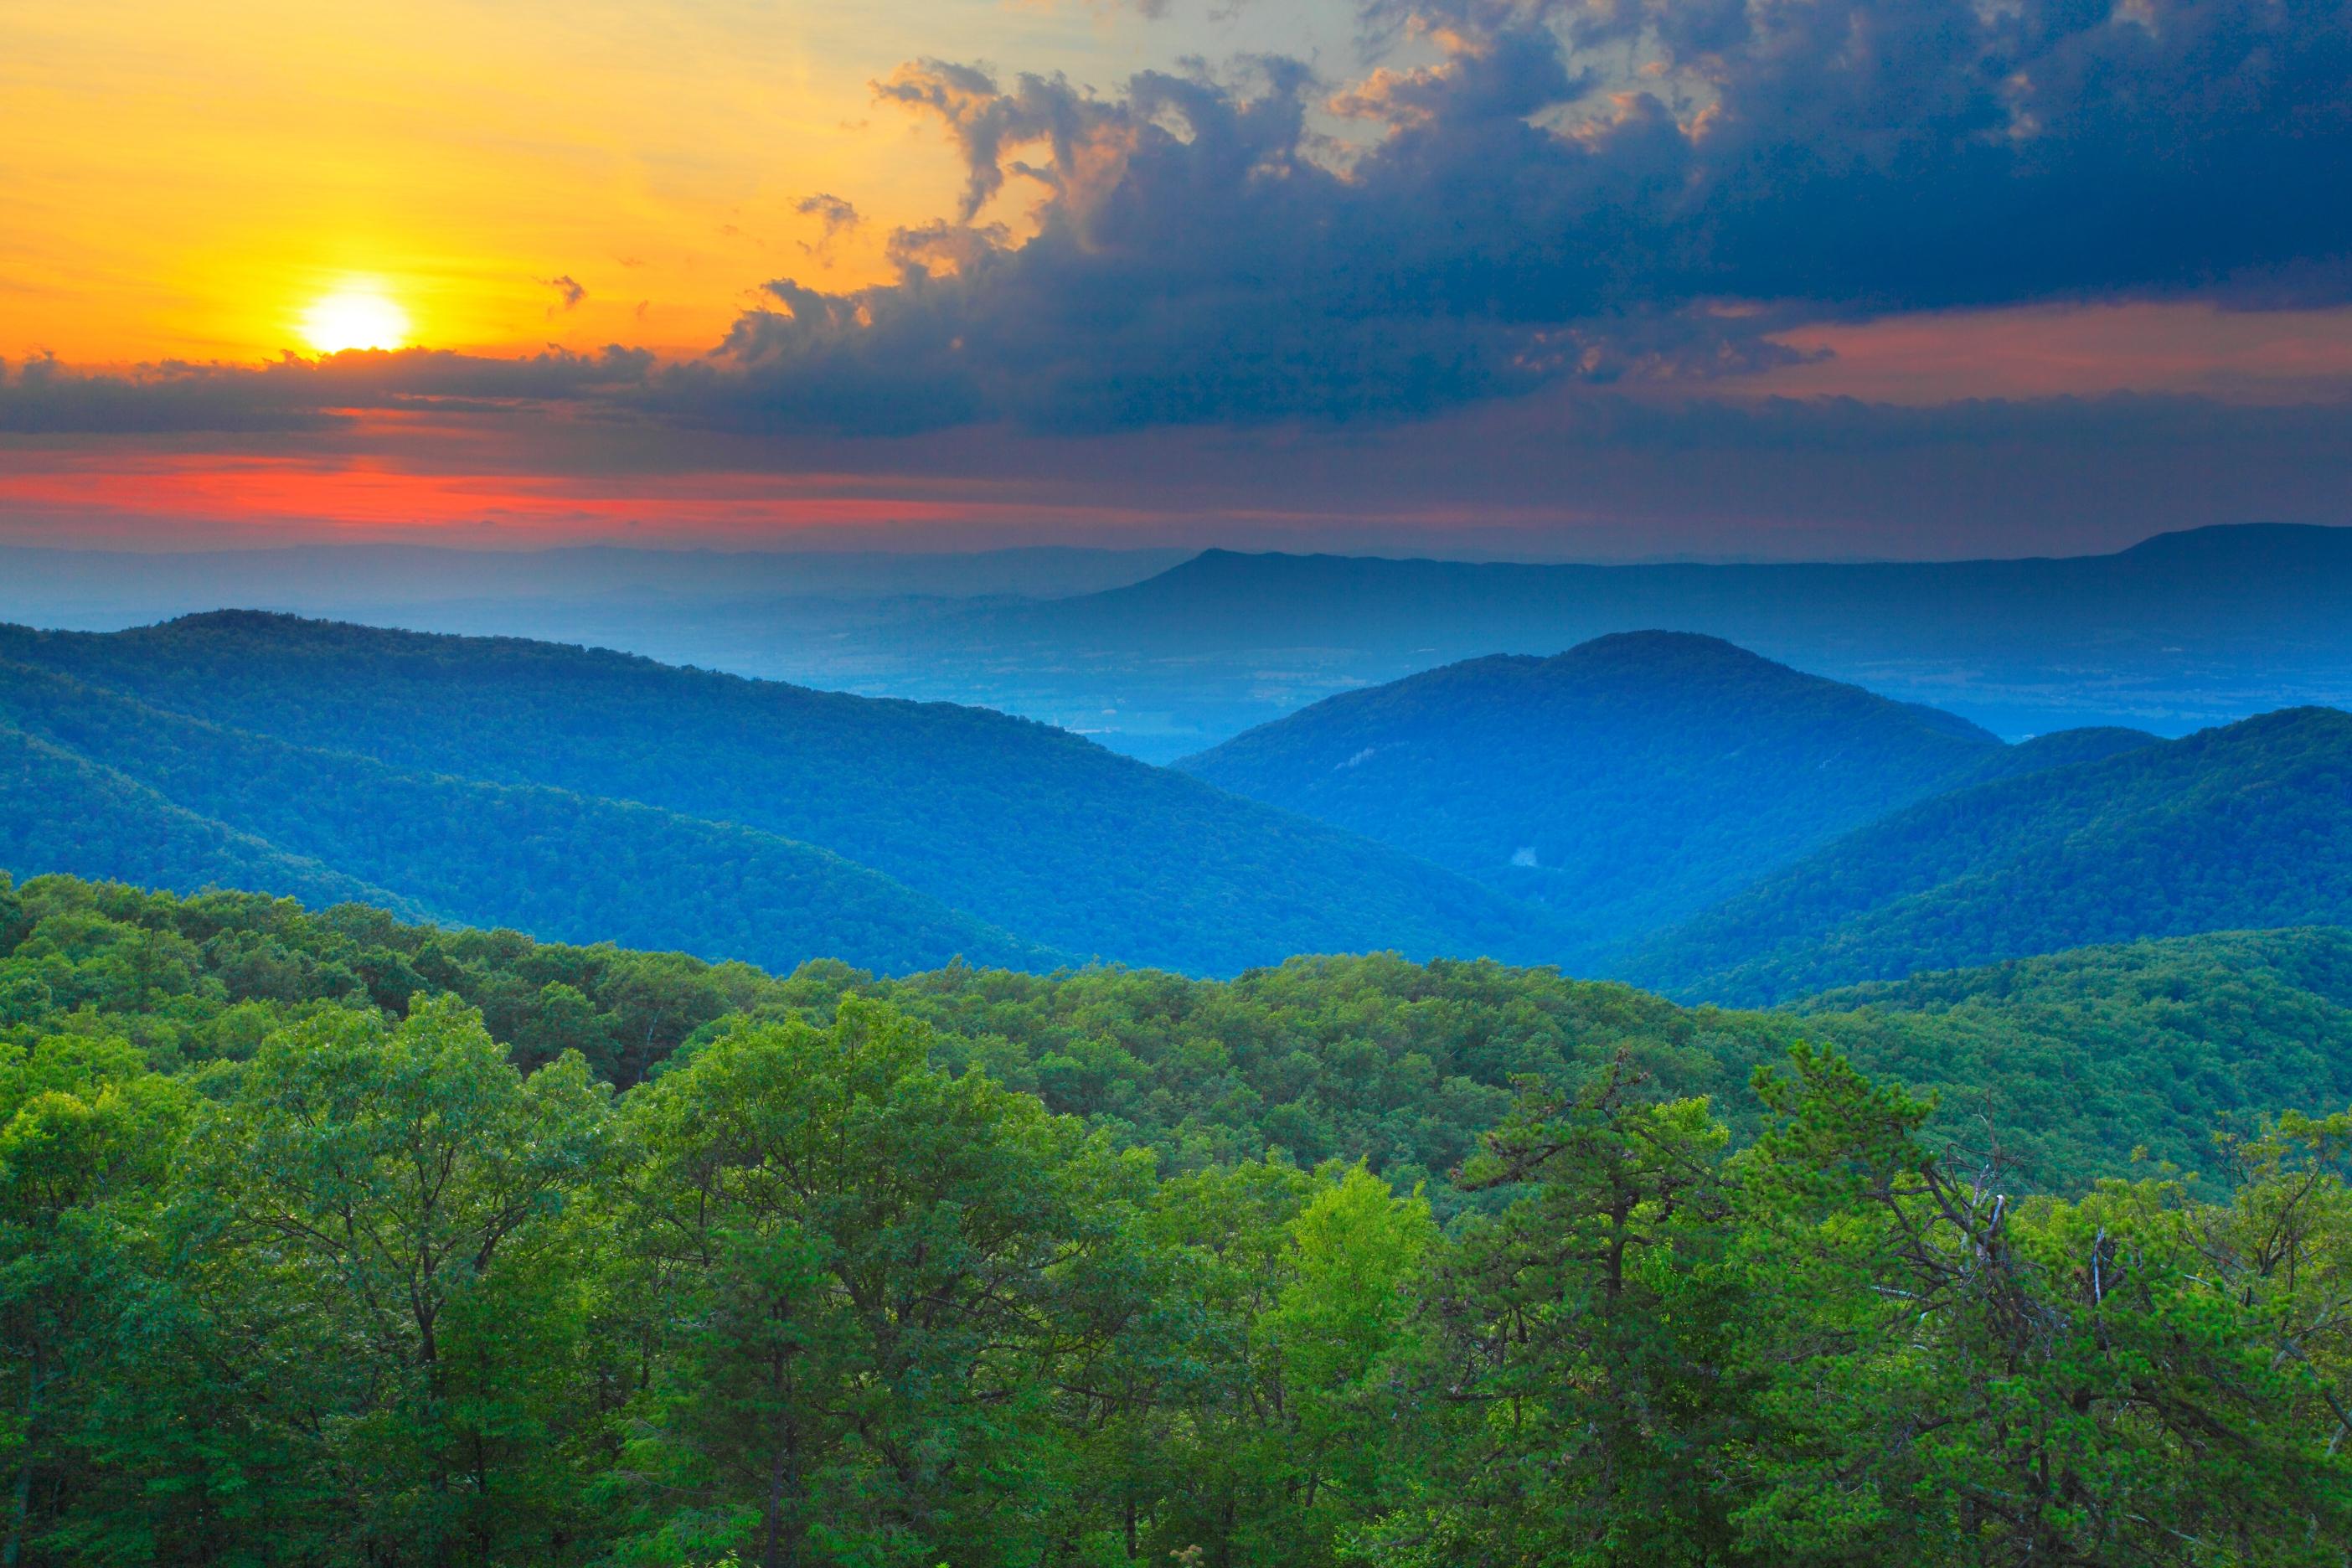 Virginia's Blue Ridge Blog - Roanoke, VA